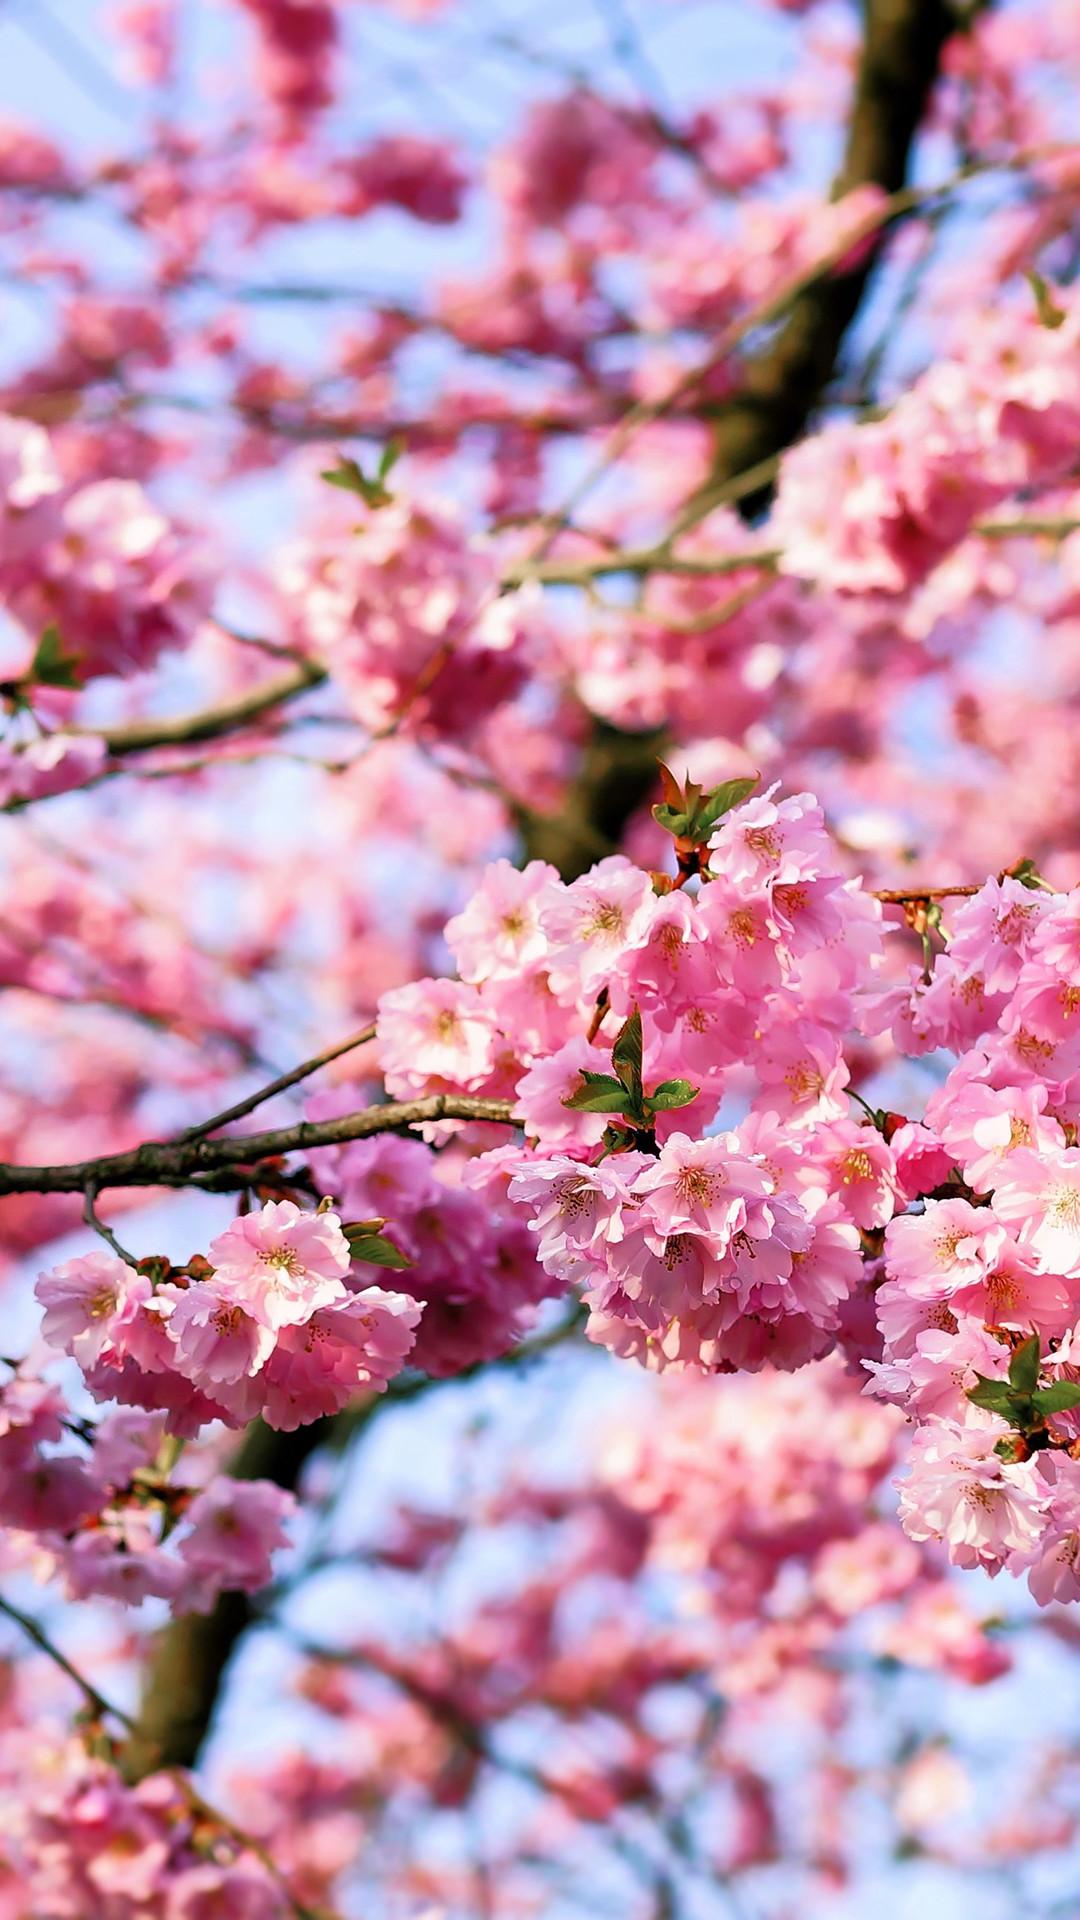 Cherry Blossom Tree Phone Wallpaper